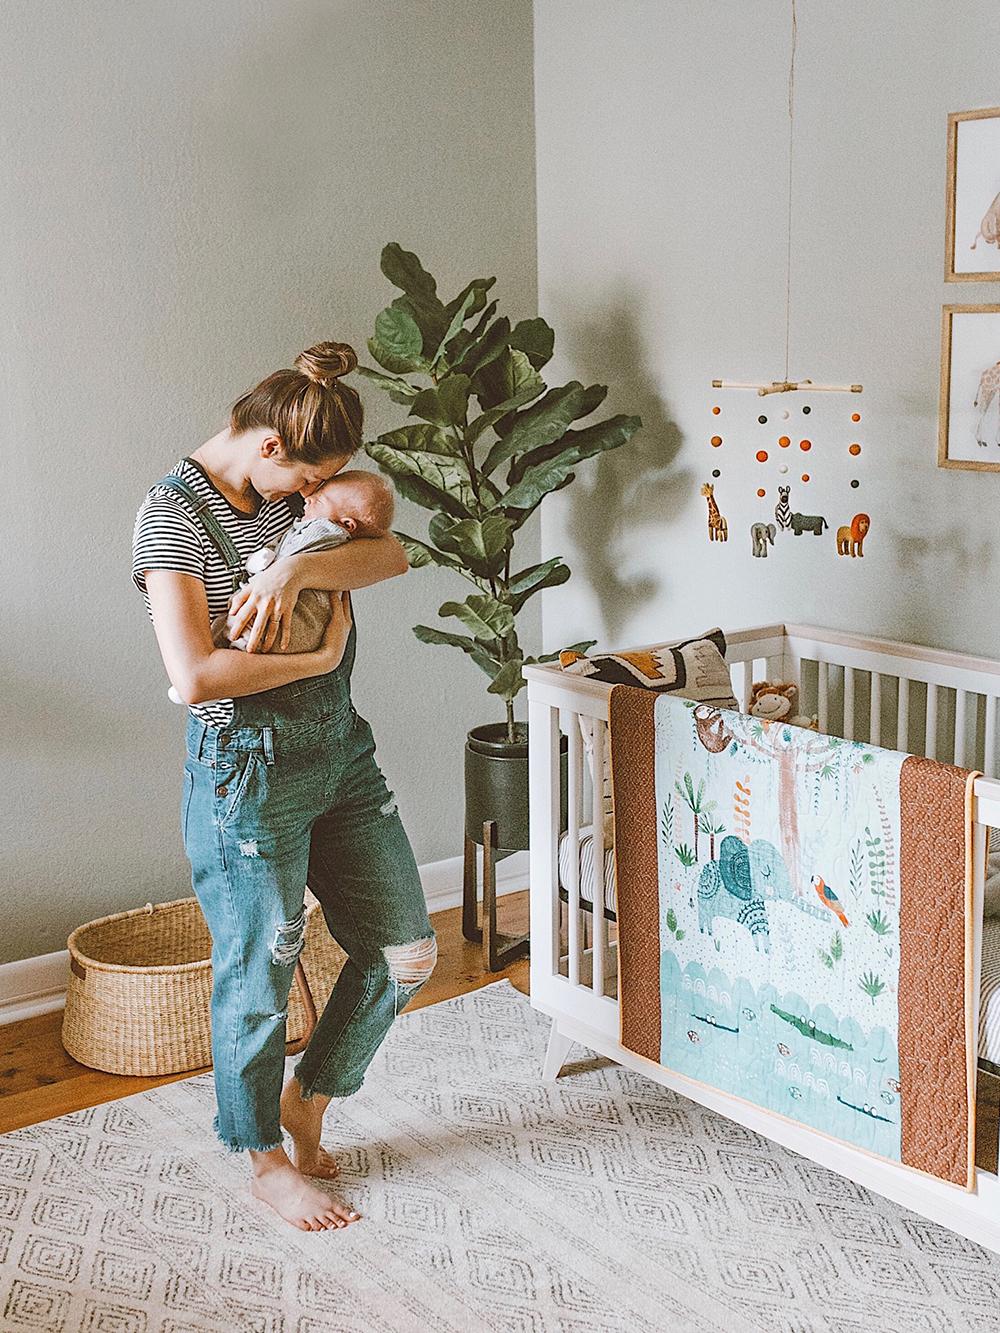 livvyland-blog-olivia-watson-austin-texas-lifestyle-blogger-baby-motherhood-one-month-update-2